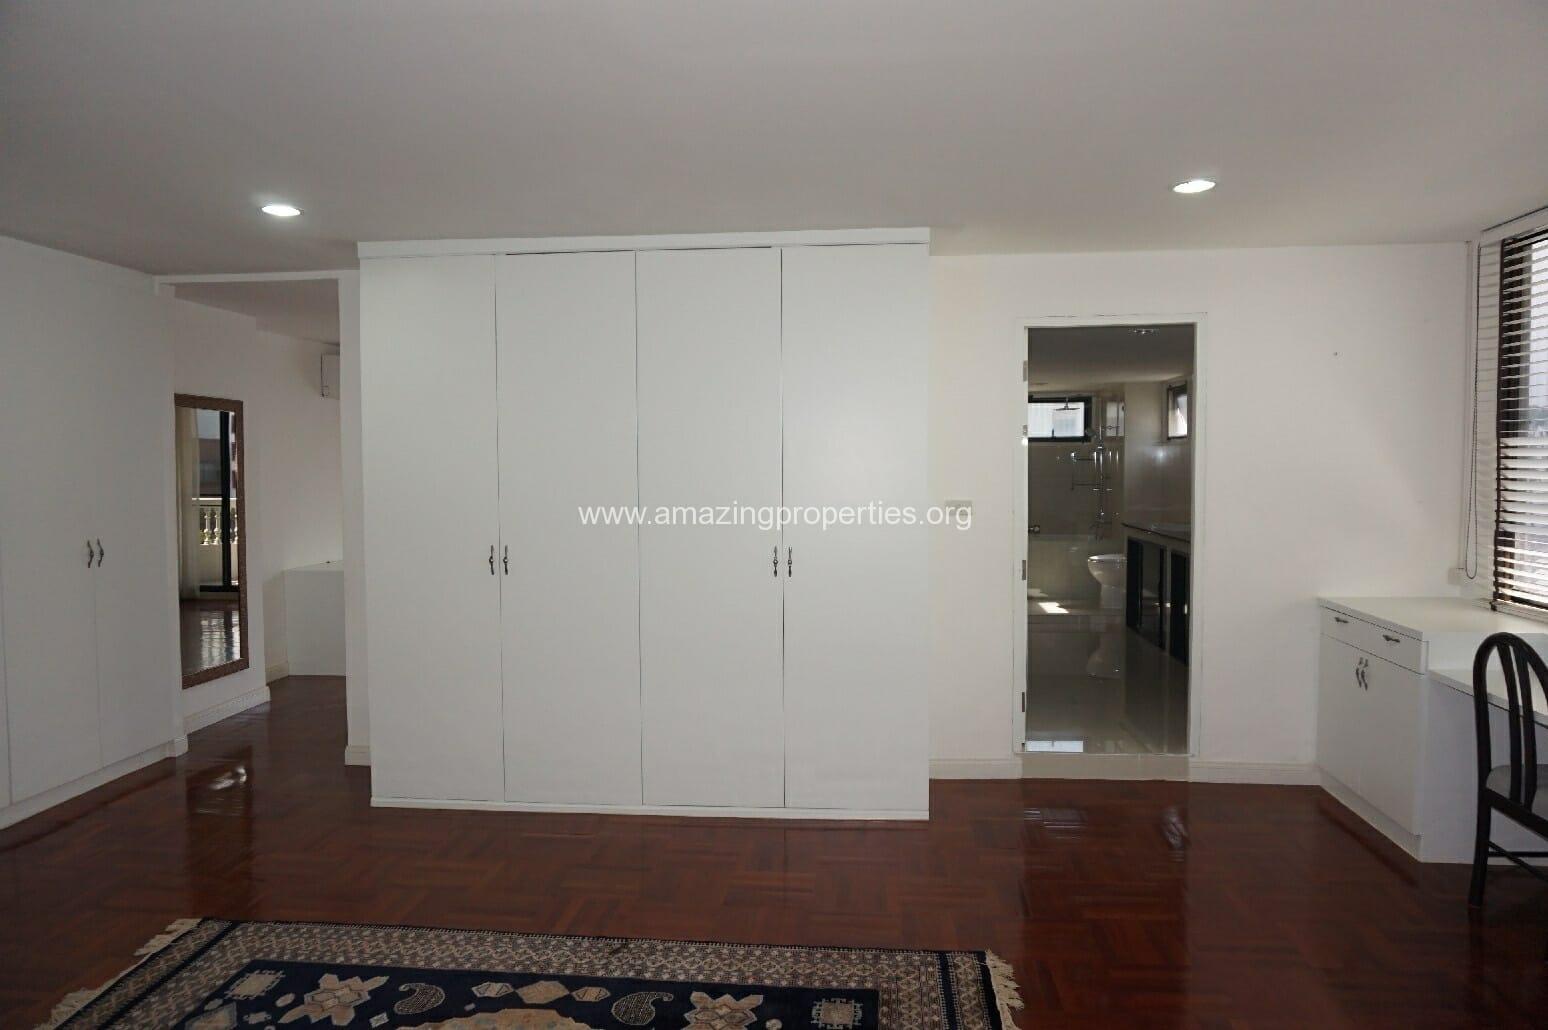 4 Bedroom Grand Ville House 2-10